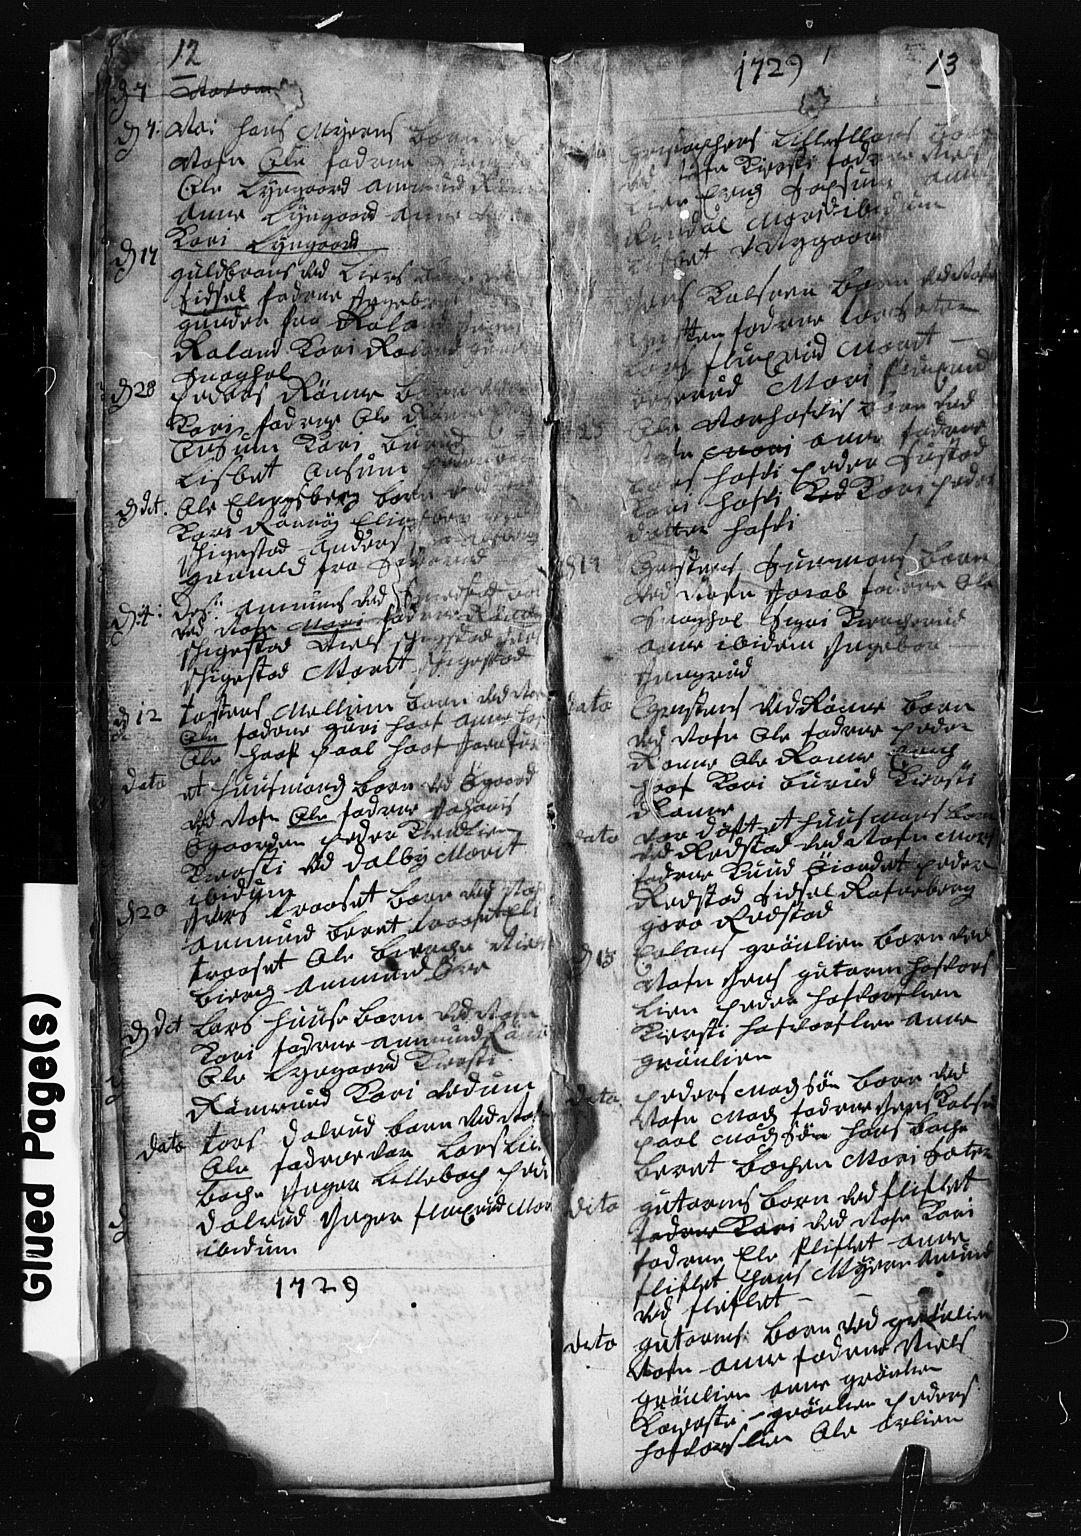 SAH, Fåberg prestekontor, Klokkerbok nr. 1, 1727-1767, s. 12-13